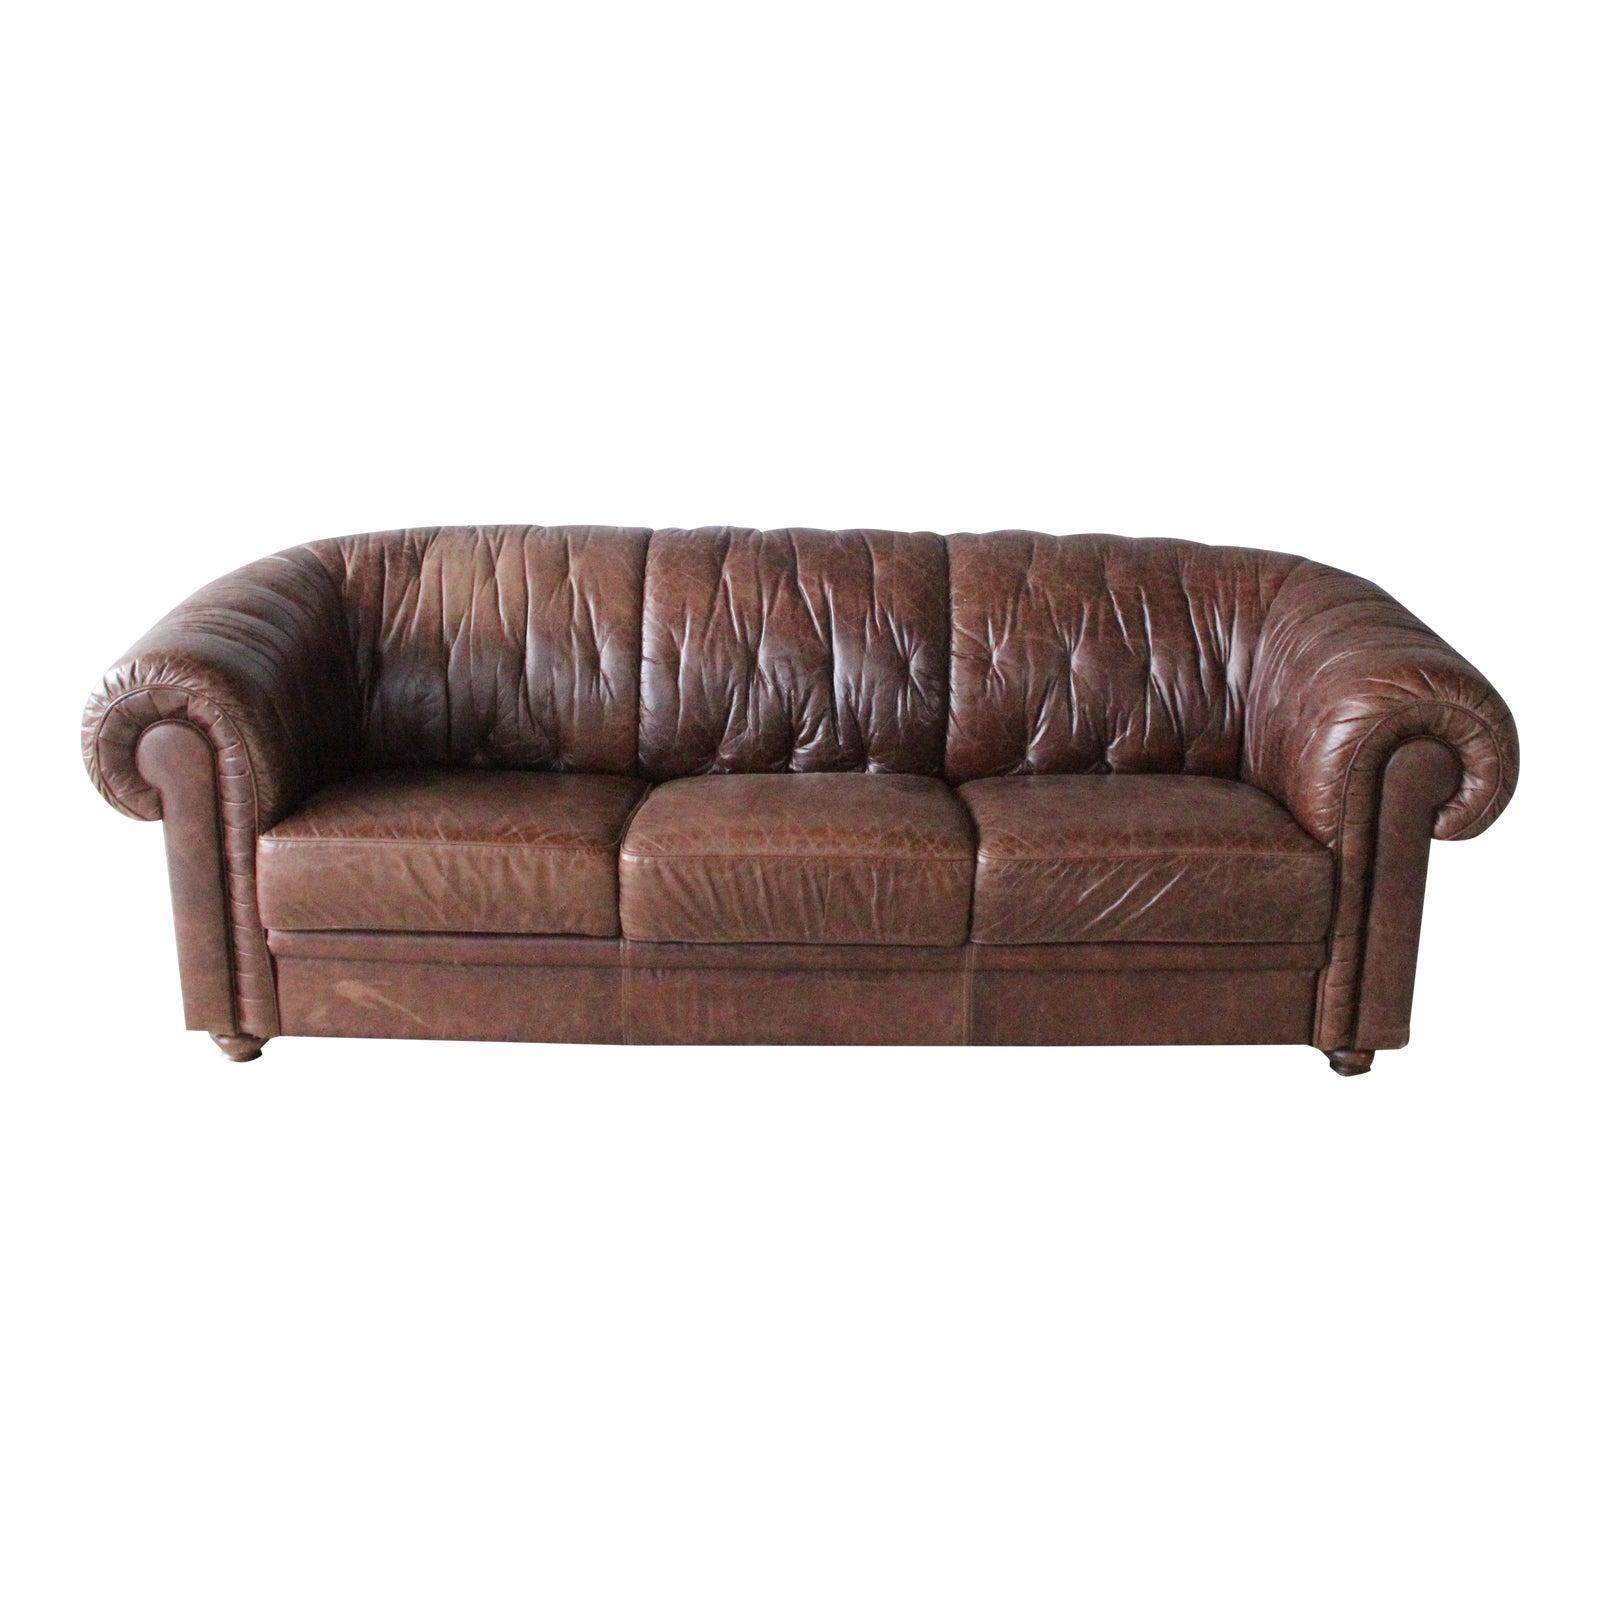 1960s Vintage Italian Leather Sofa | Chairish